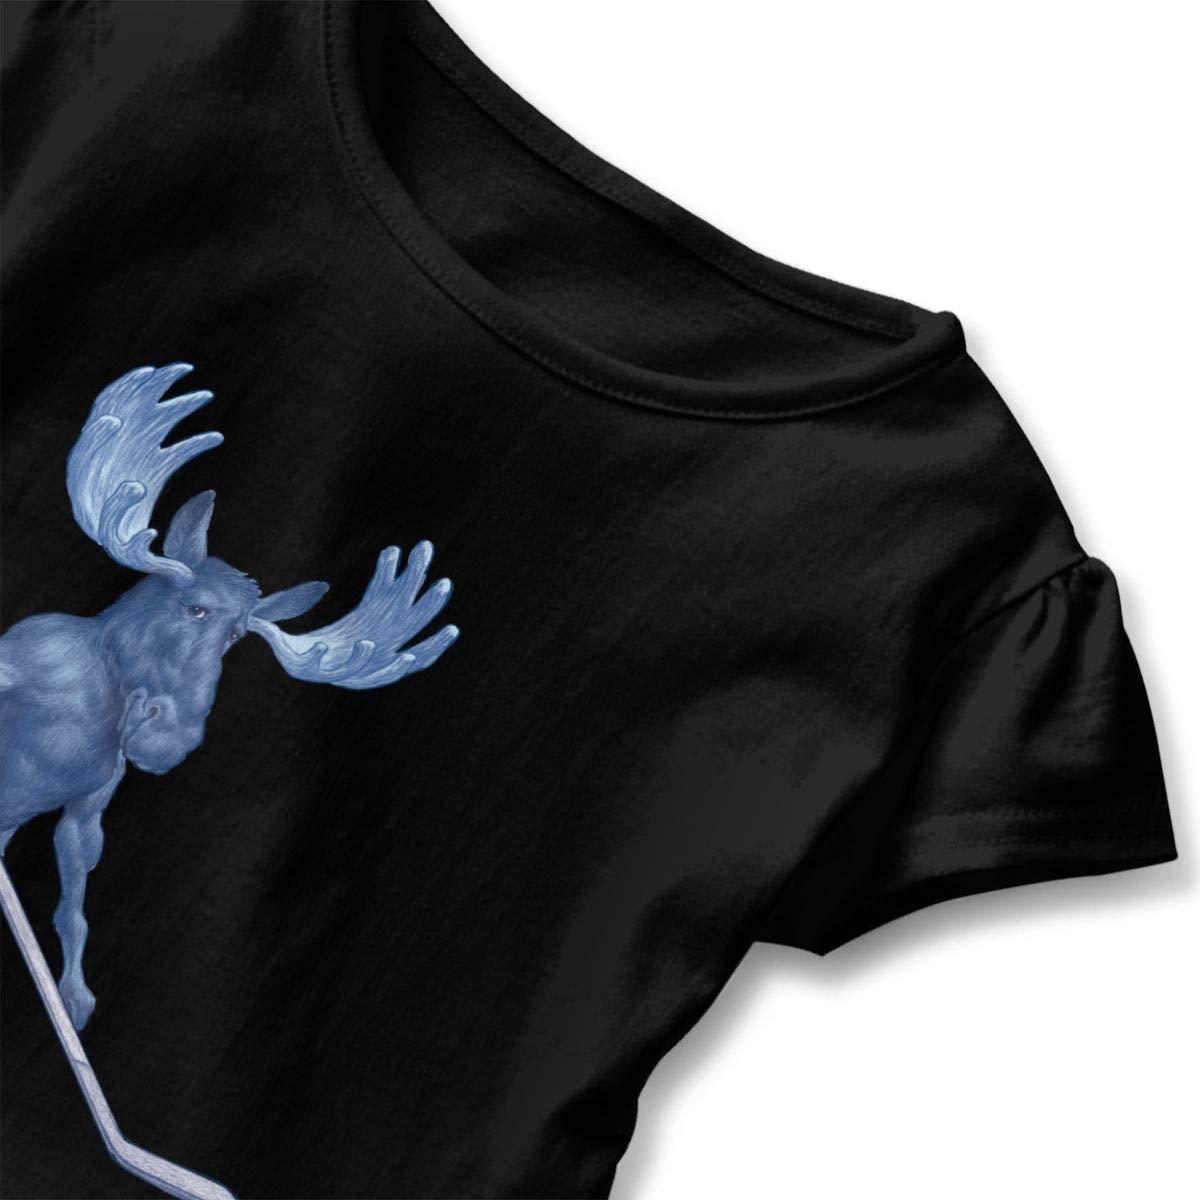 JVNSS Blue Moose Shirt Printed Toddler Flounced T Shirts Shirt Dress for 2-6T Baby Girls